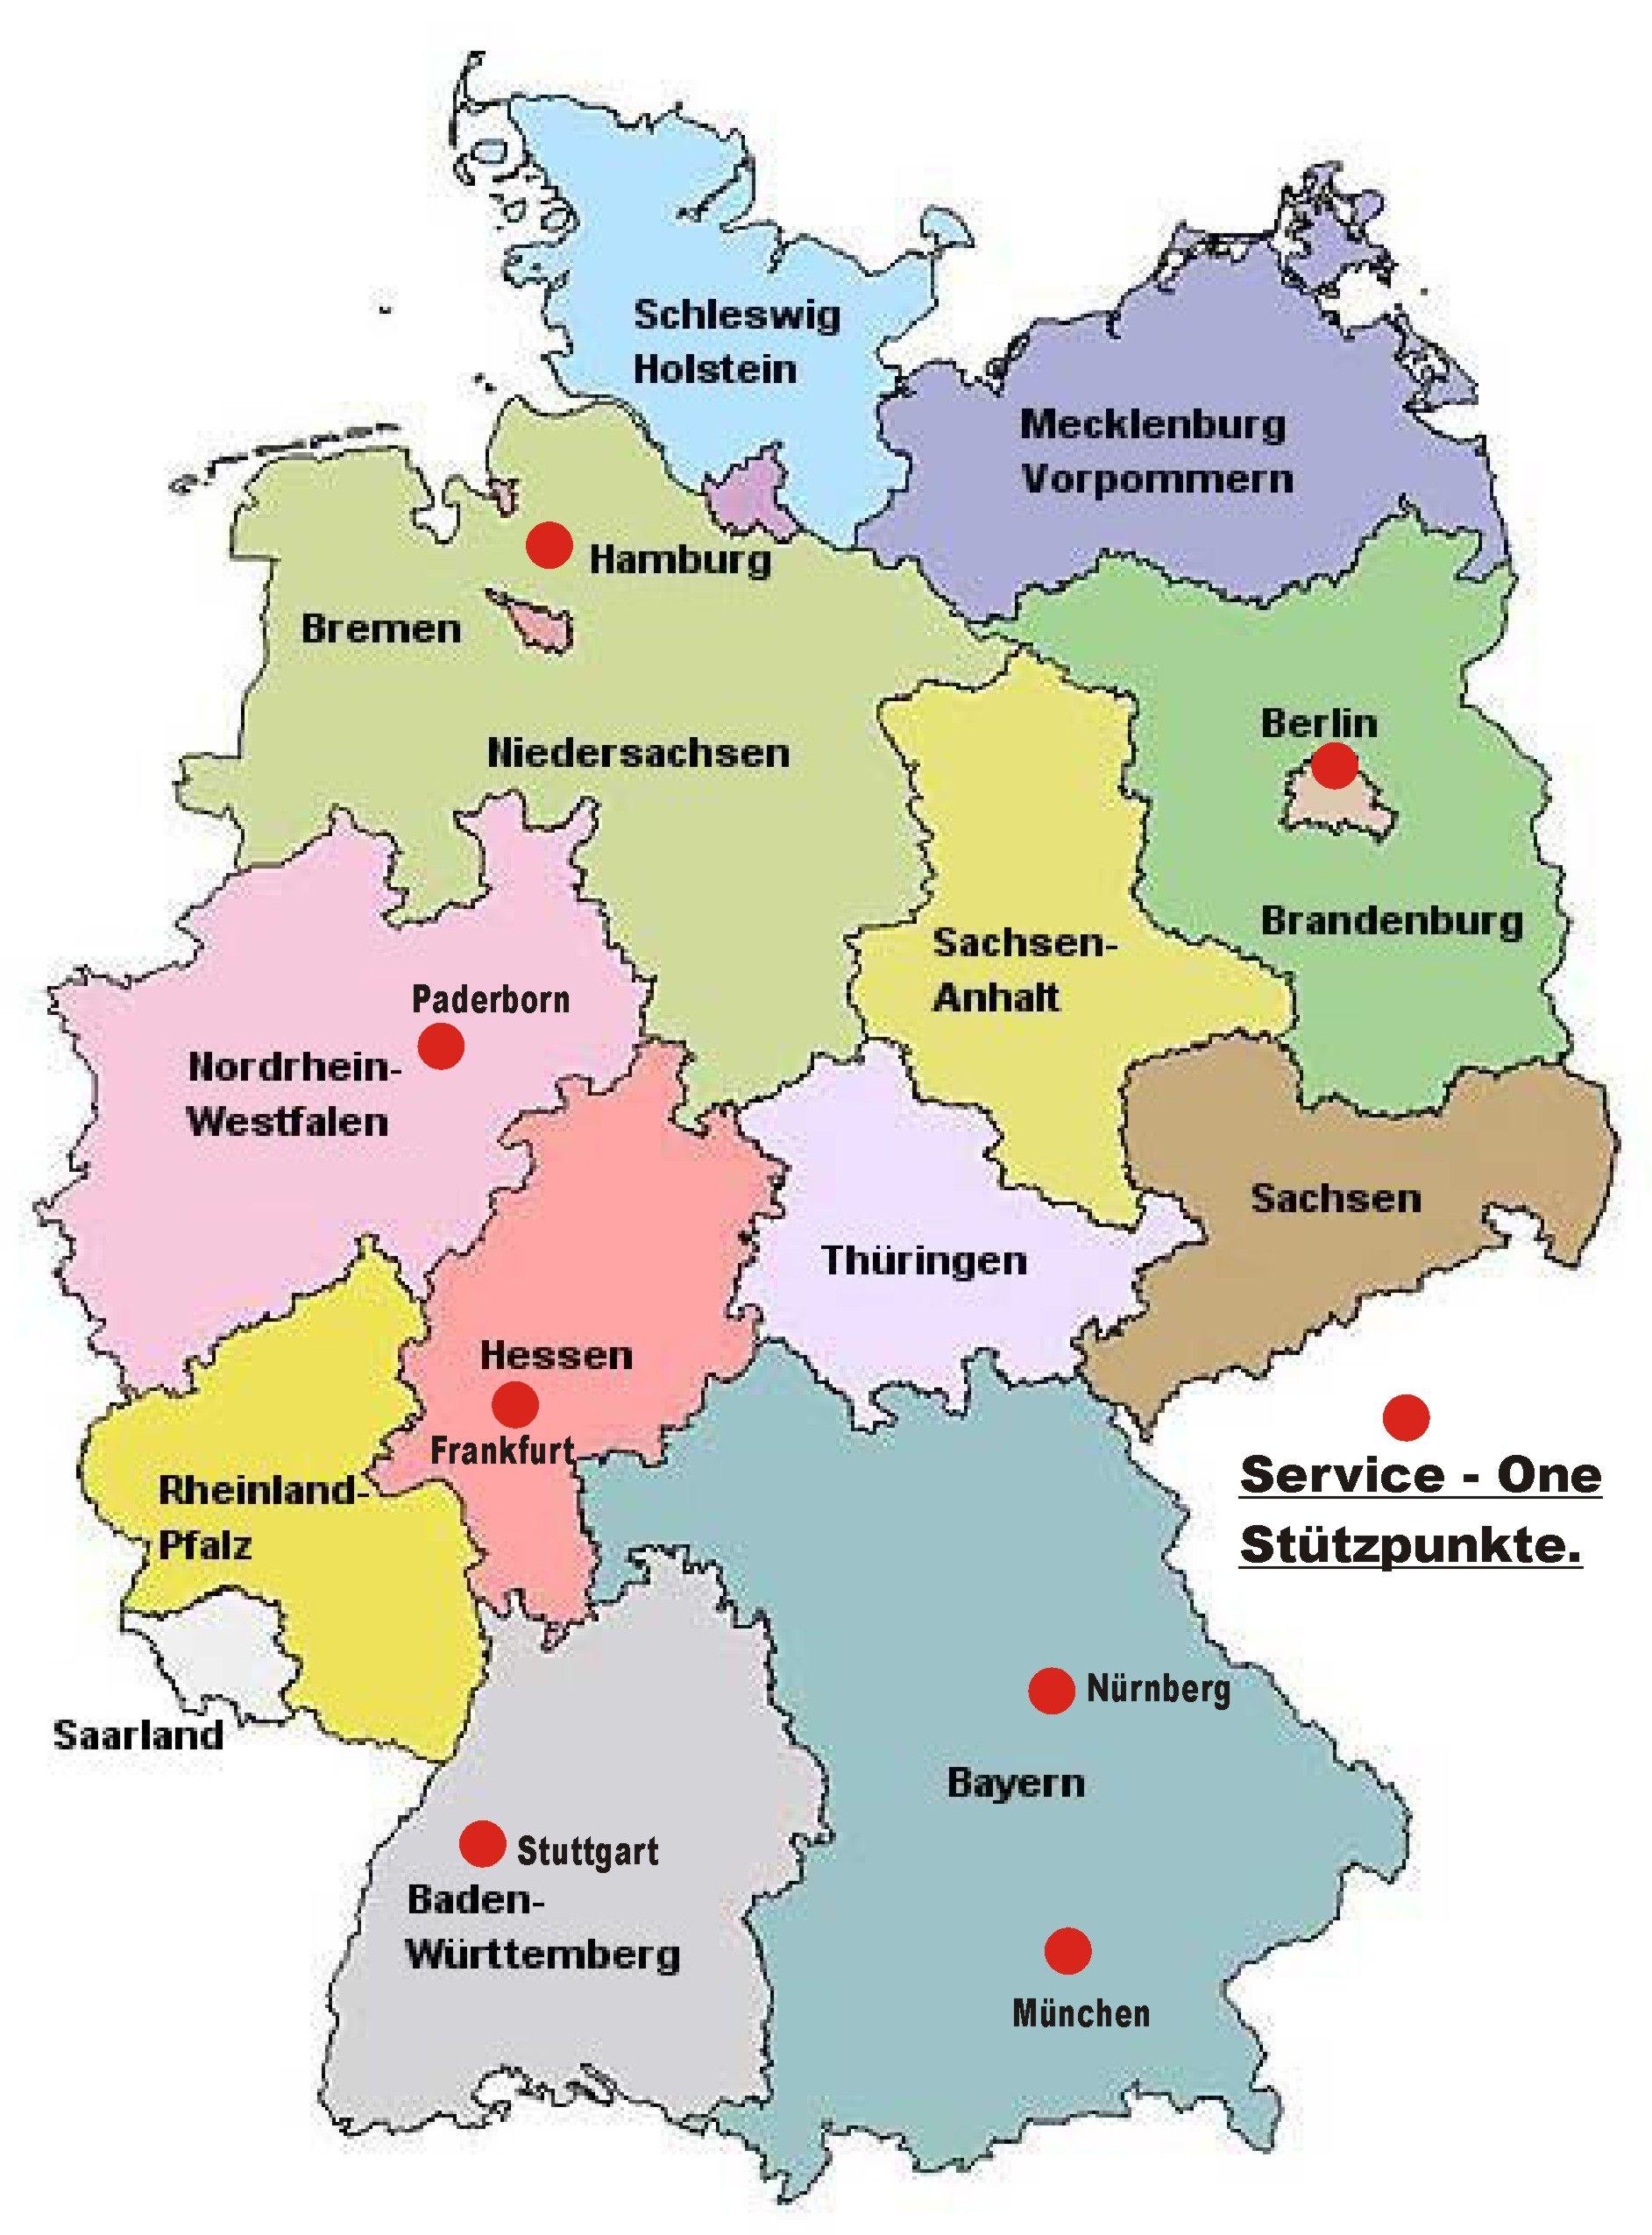 deutschlandkarte  bullet journal  Deutschlandkarte